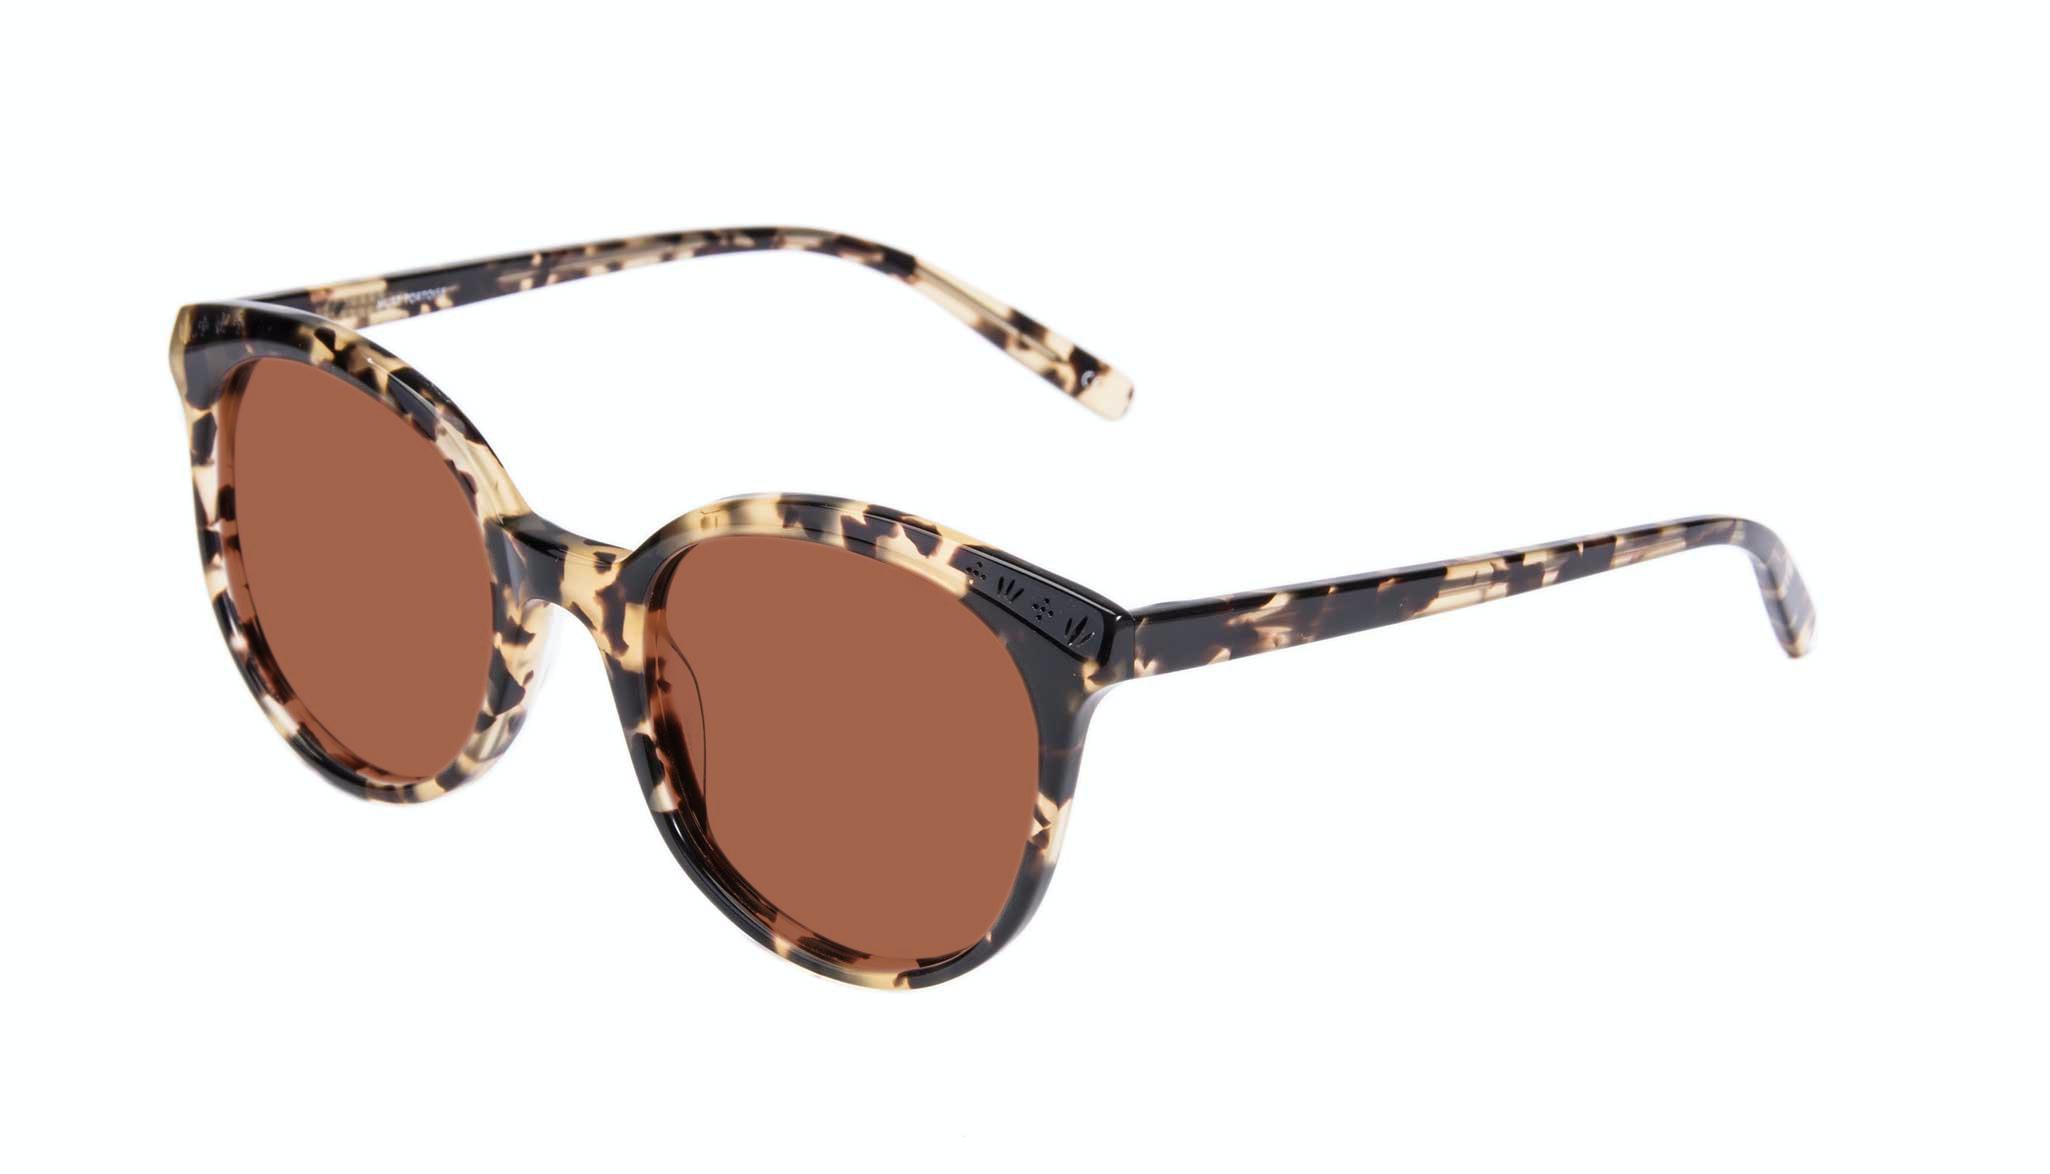 Affordable Fashion Glasses Round Sunglasses Women Must Tortoise Tilt